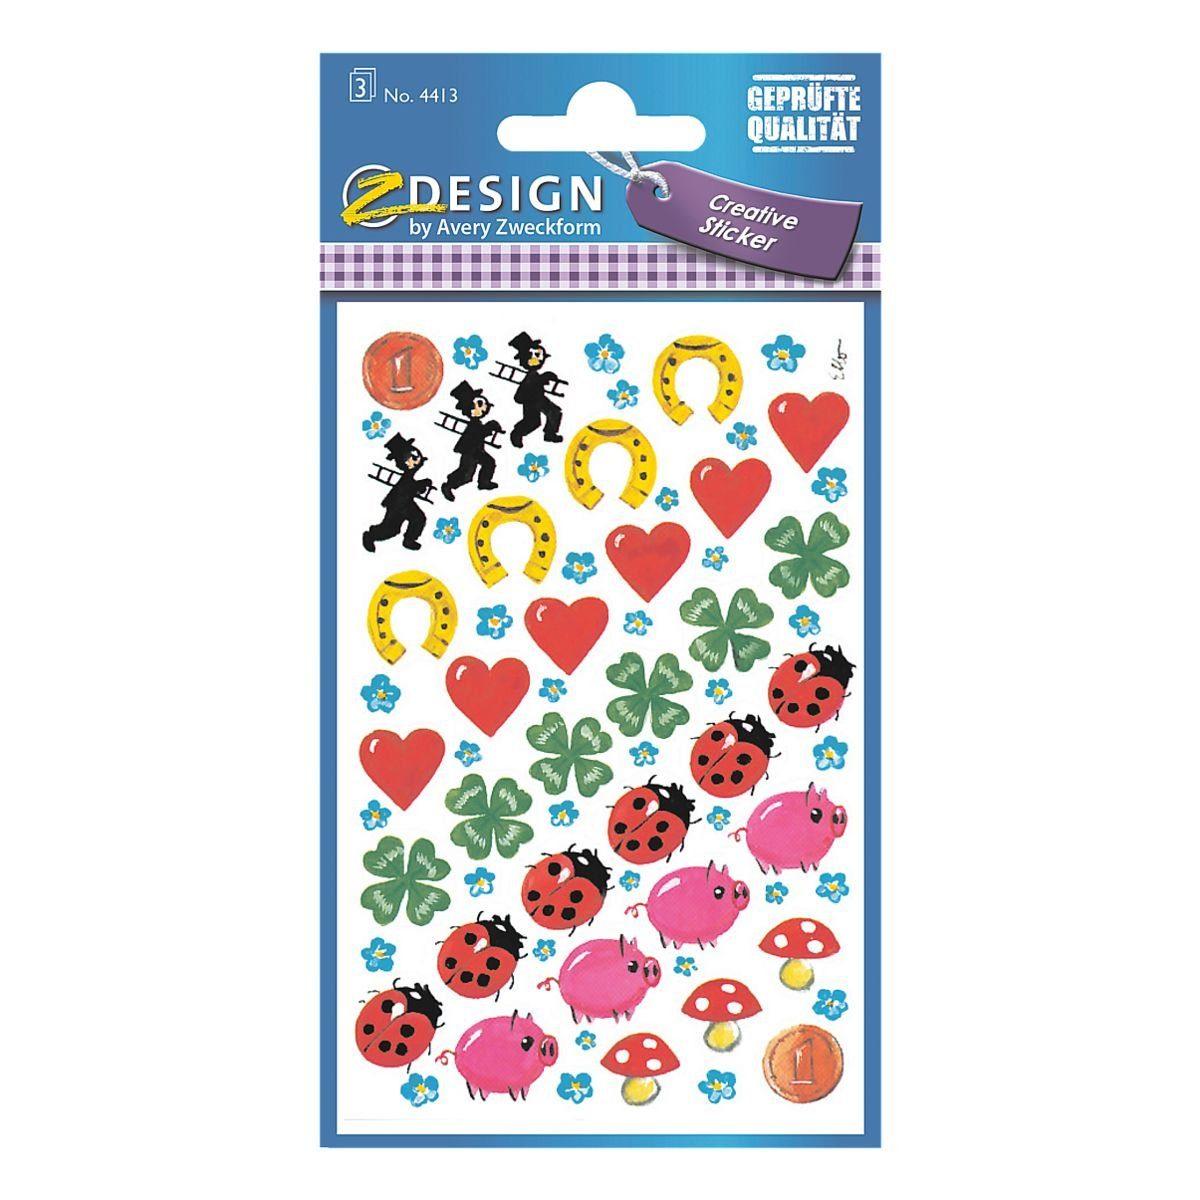 Z-Design Papier Sticker »Glücksbringer«